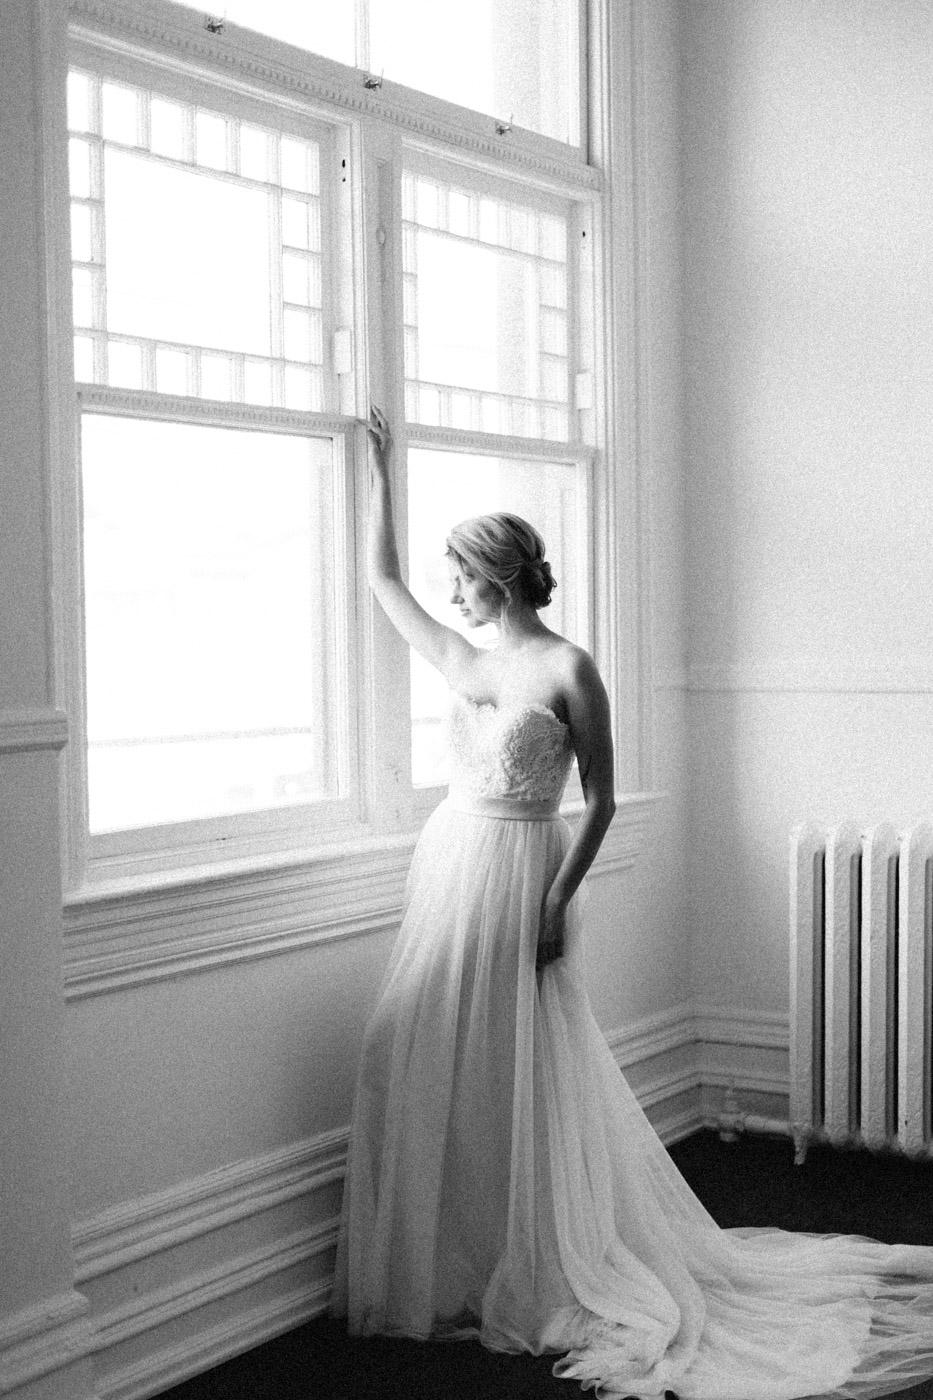 the_great_hall_wedding_photos 2017-59.jpg